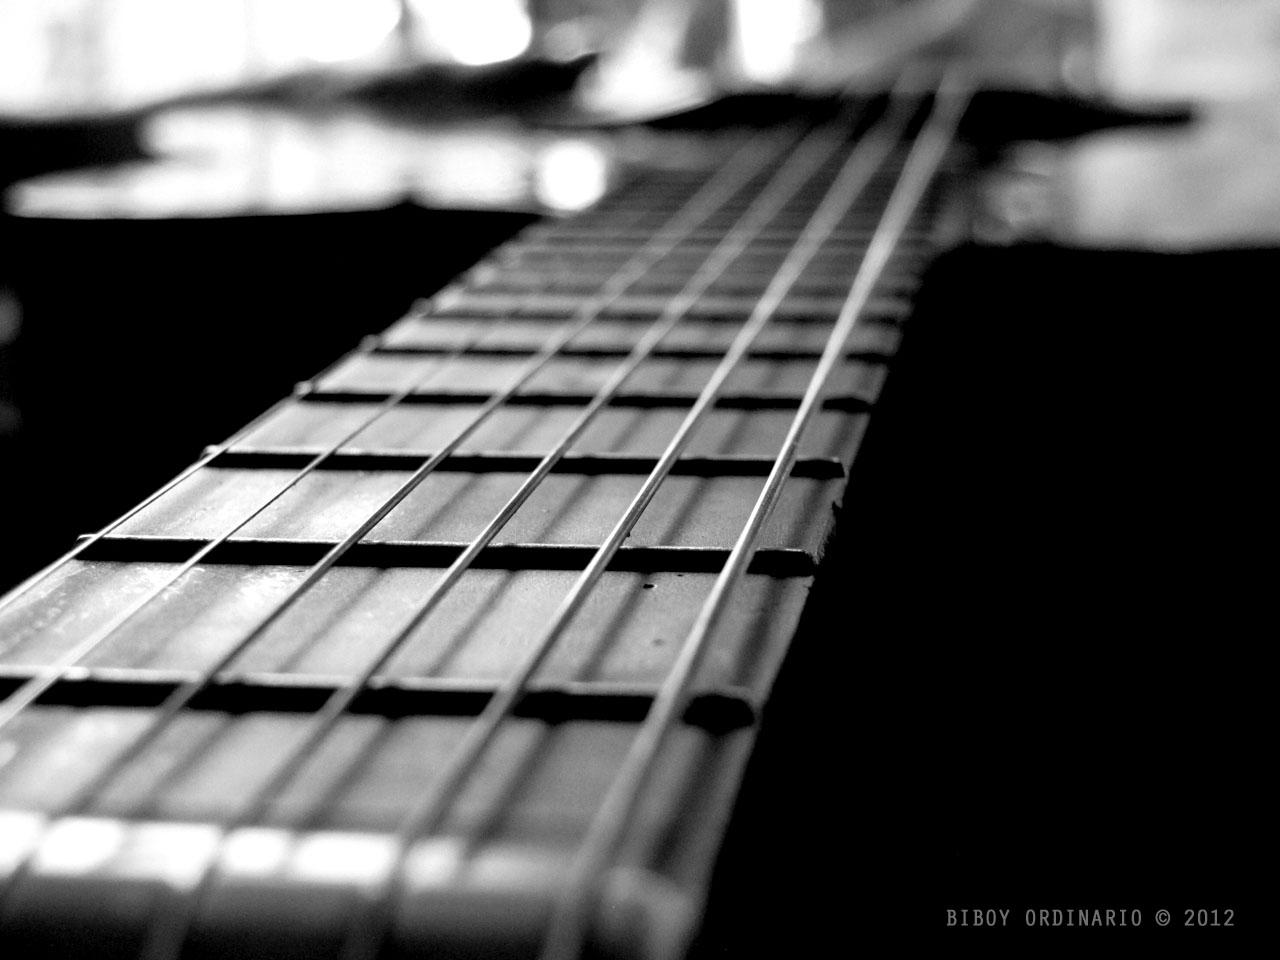 a beautiful Philippine made guitar